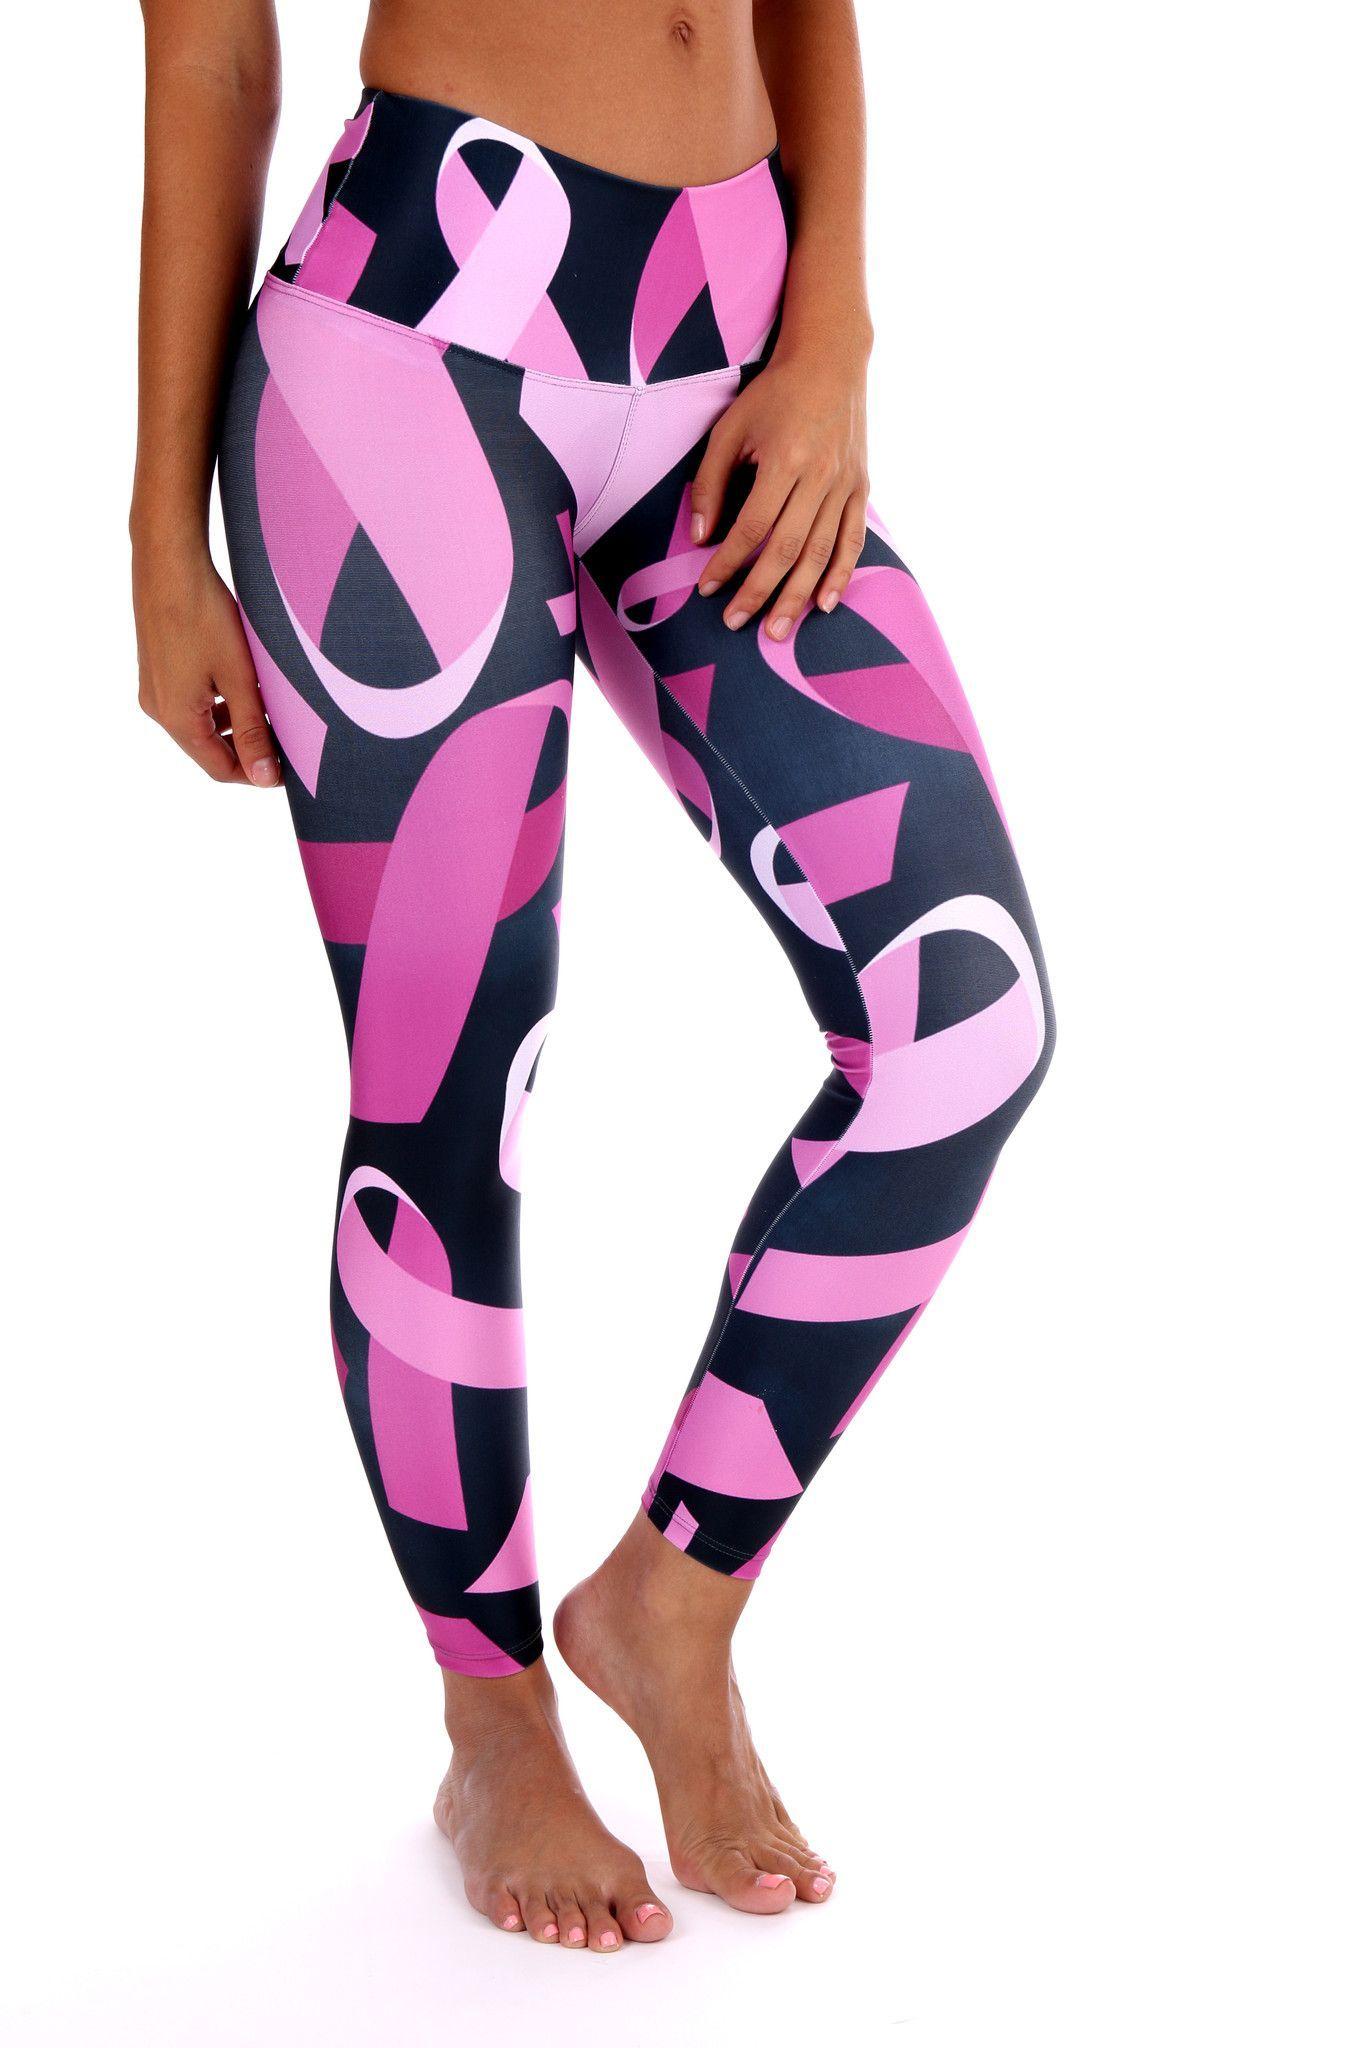 b9740c307748 Pink ribbon legging   Crossfit   Cancer, Breast cancer support ...